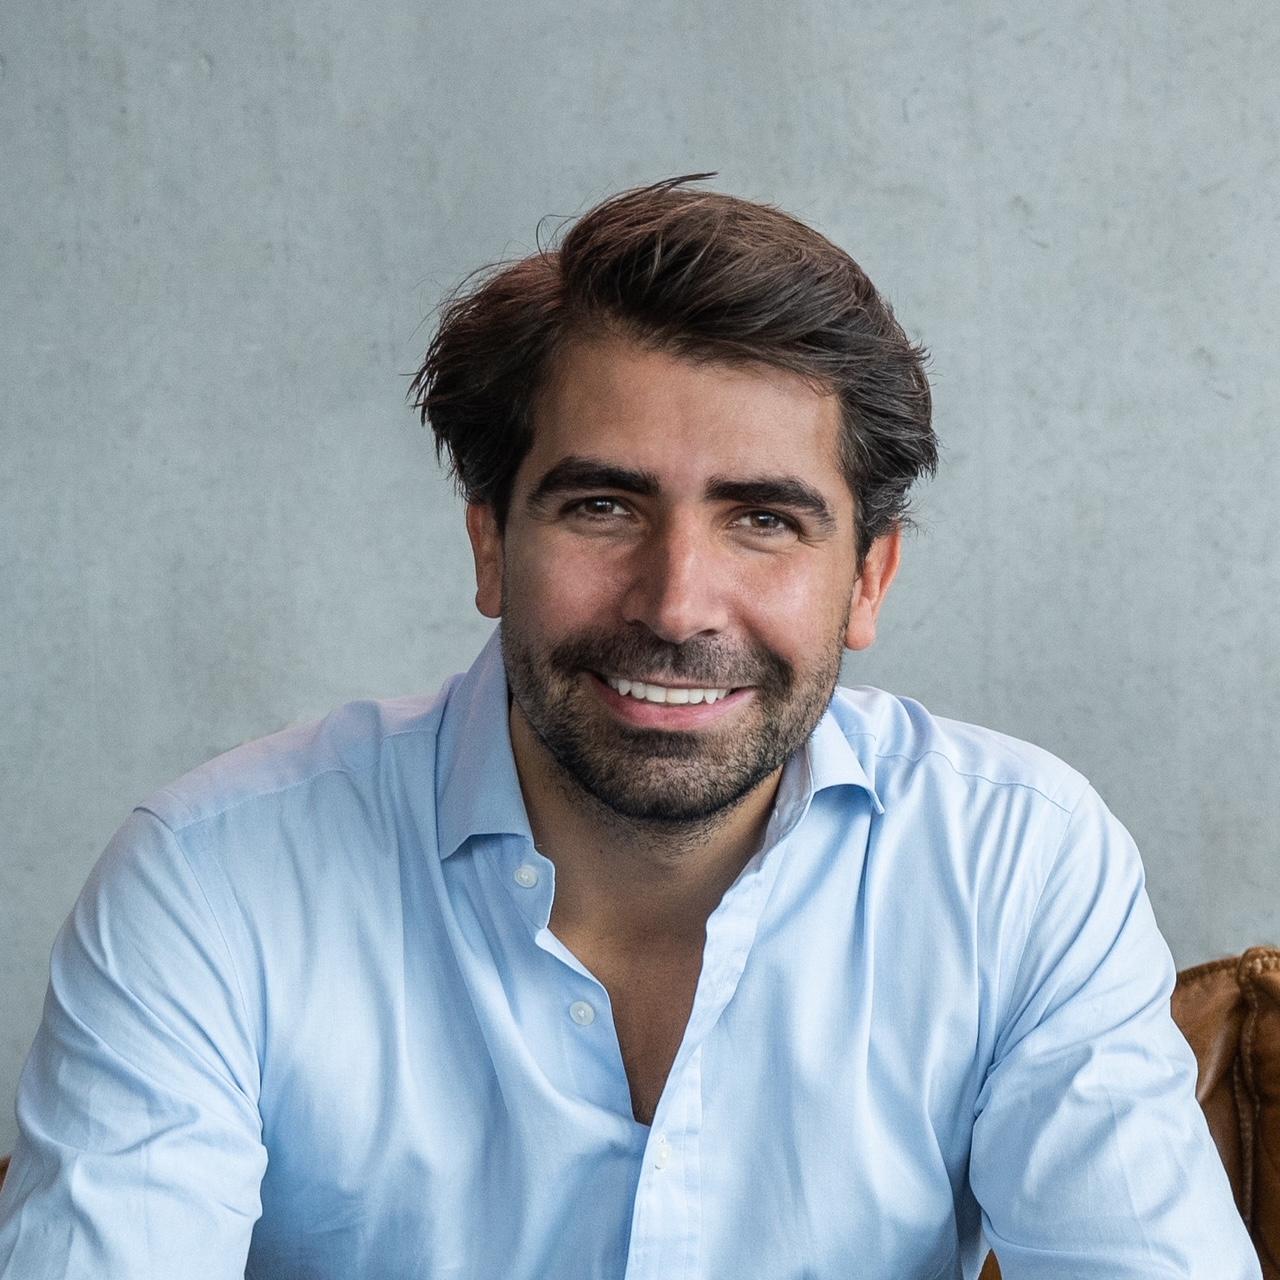 Julius Koehler, Co-Founder and Chief Business Development Manager, Sennder